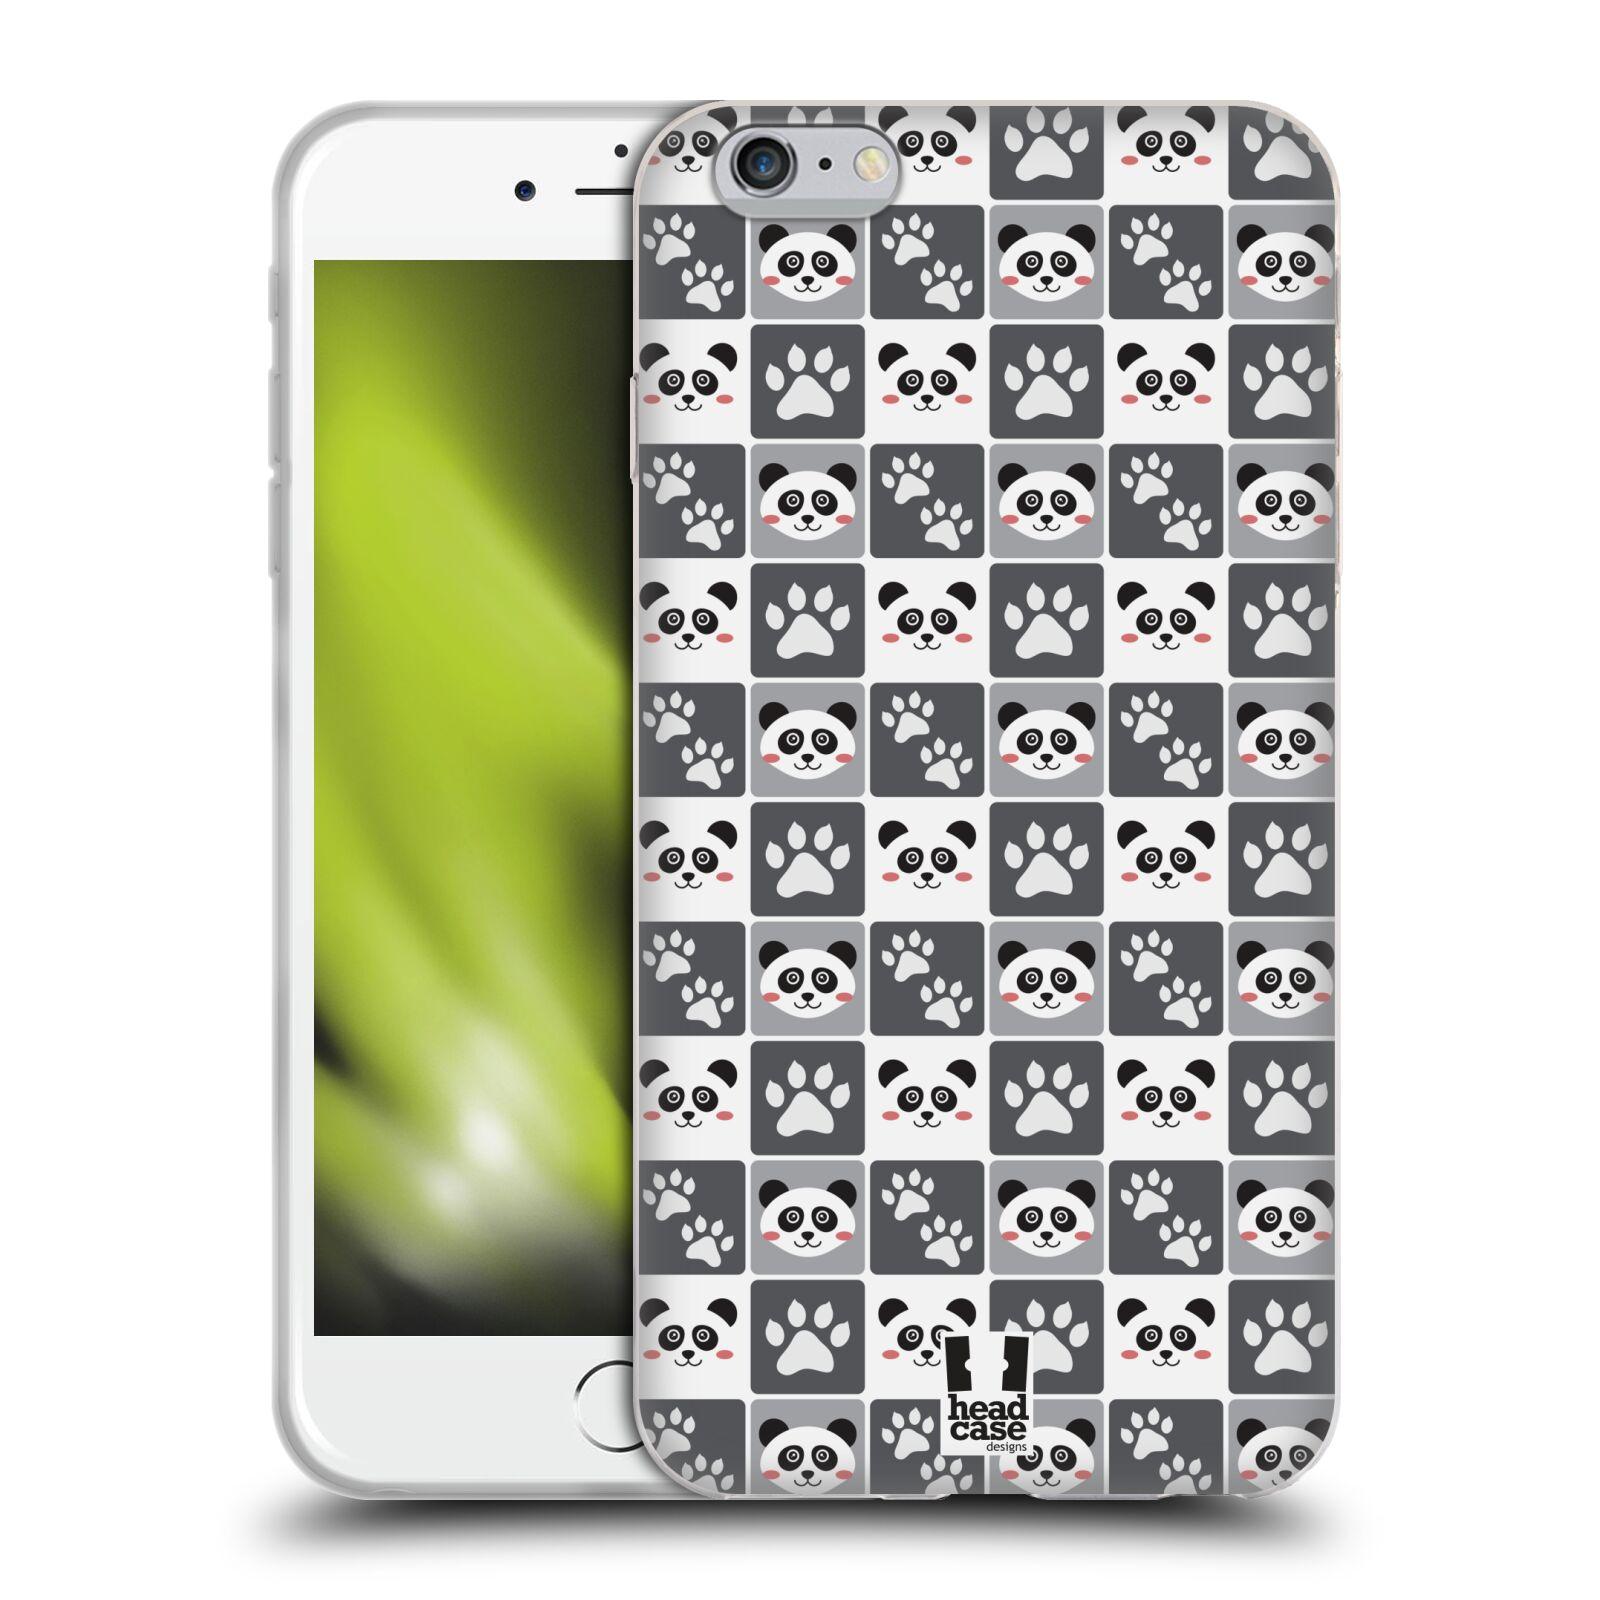 HEAD CASE silikonový obal na mobil Apple Iphone 6 PLUS/ 6S PLUS vzor Zvířecí razítka MEDVÍDEK PANDA